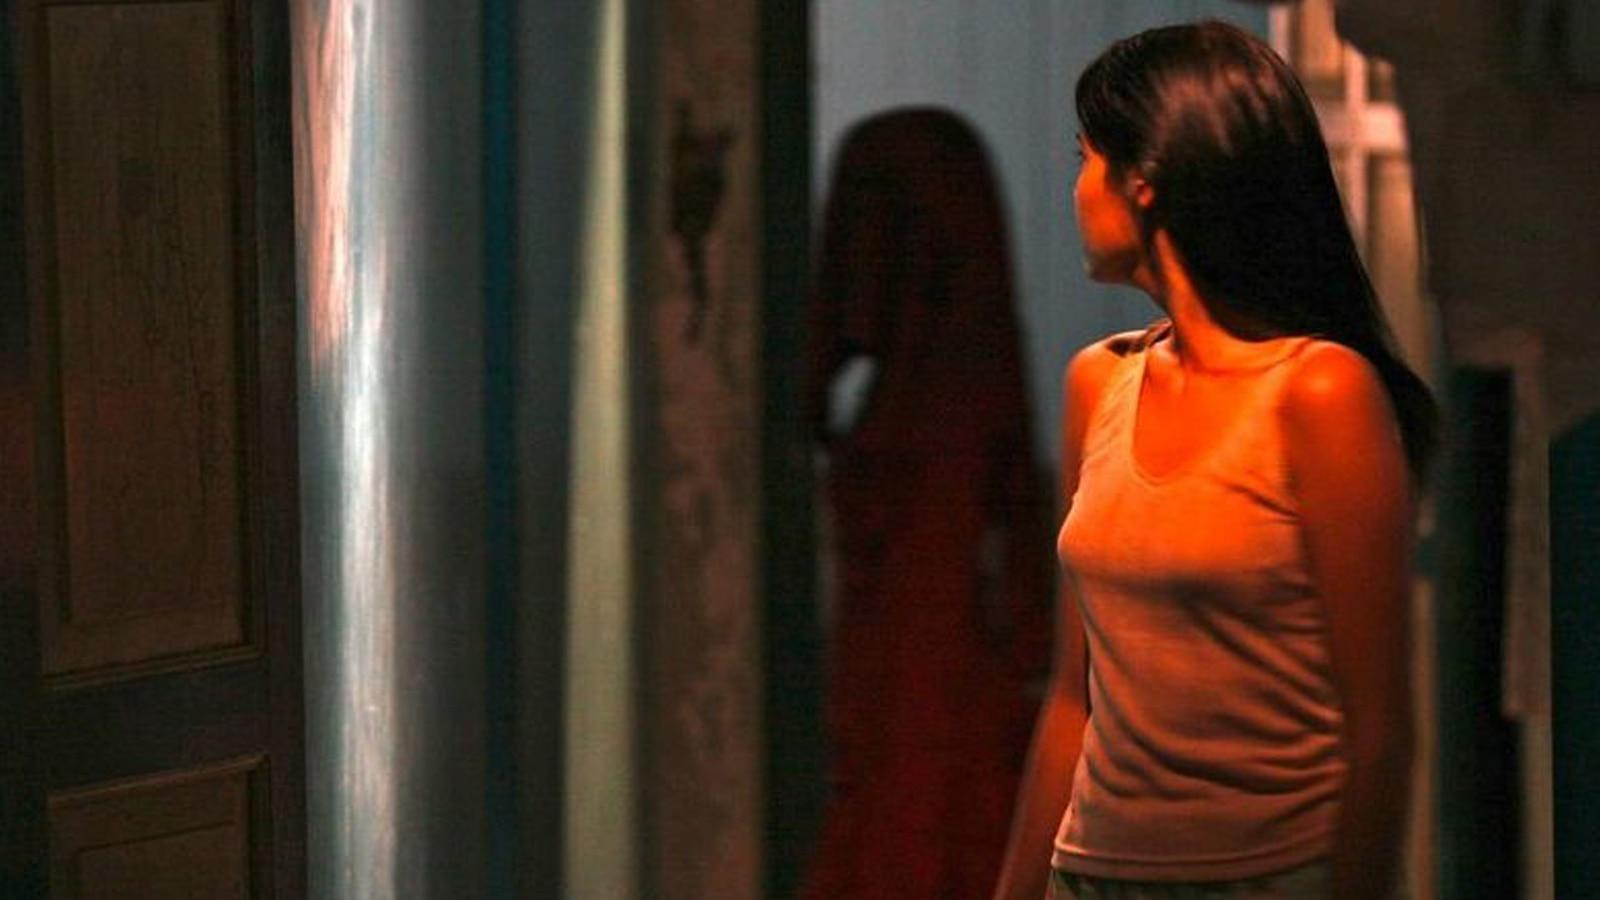 Premium Cinema 1 The maid - La morte cammina tra i vivi